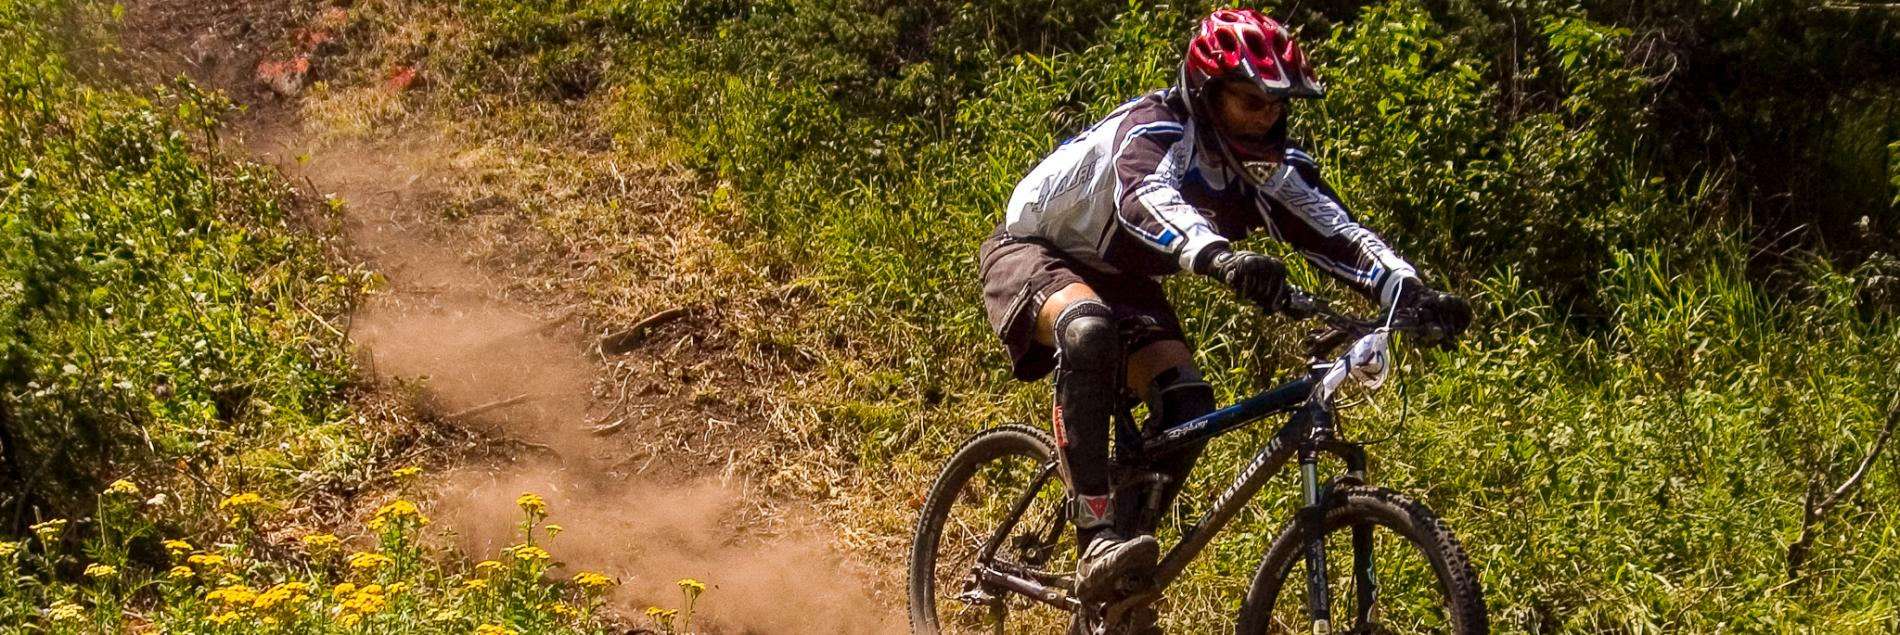 Biking Black Hills Badlands South Dakota